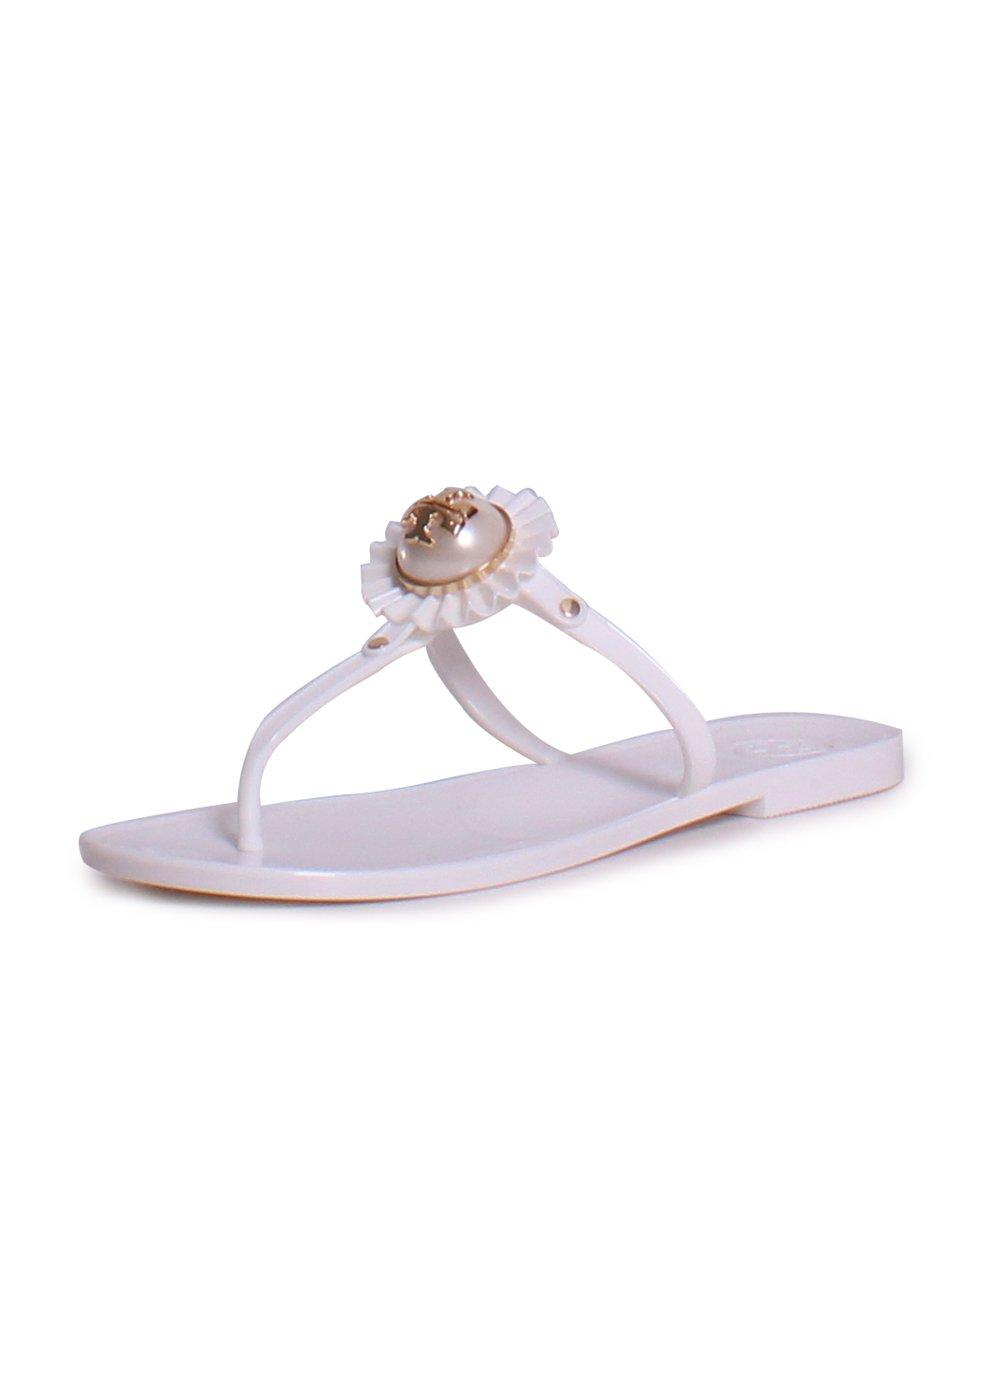 Tory Burch Melody Plastic Thong Sandal (9, White)